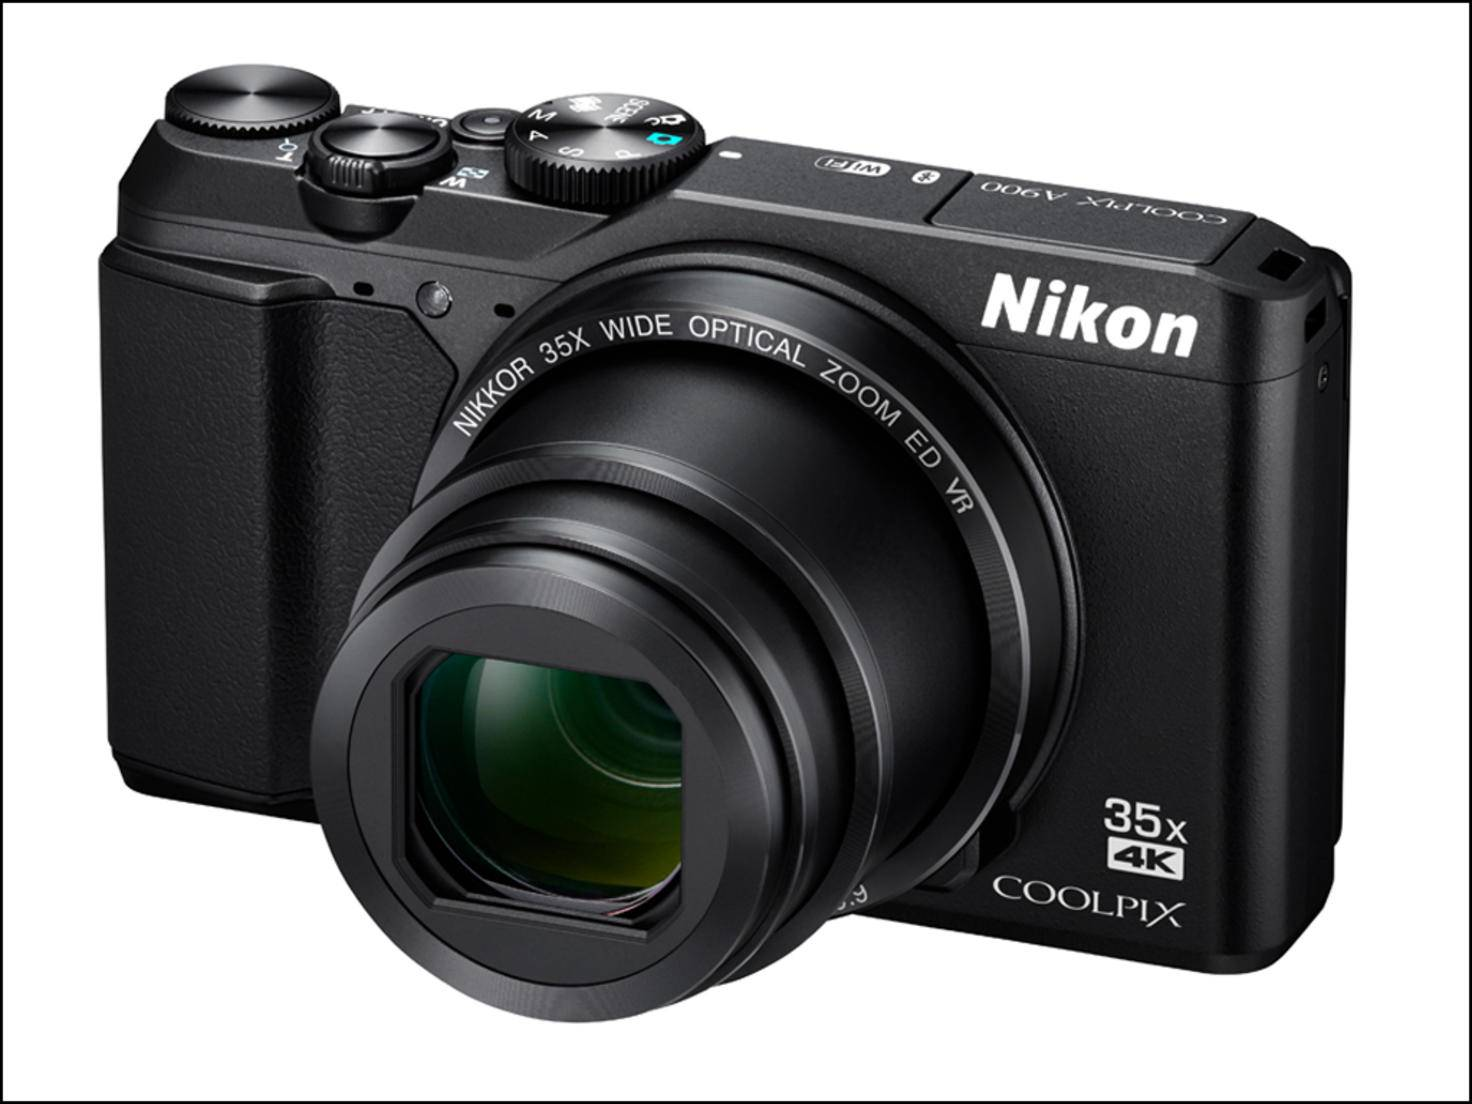 Nikon A900